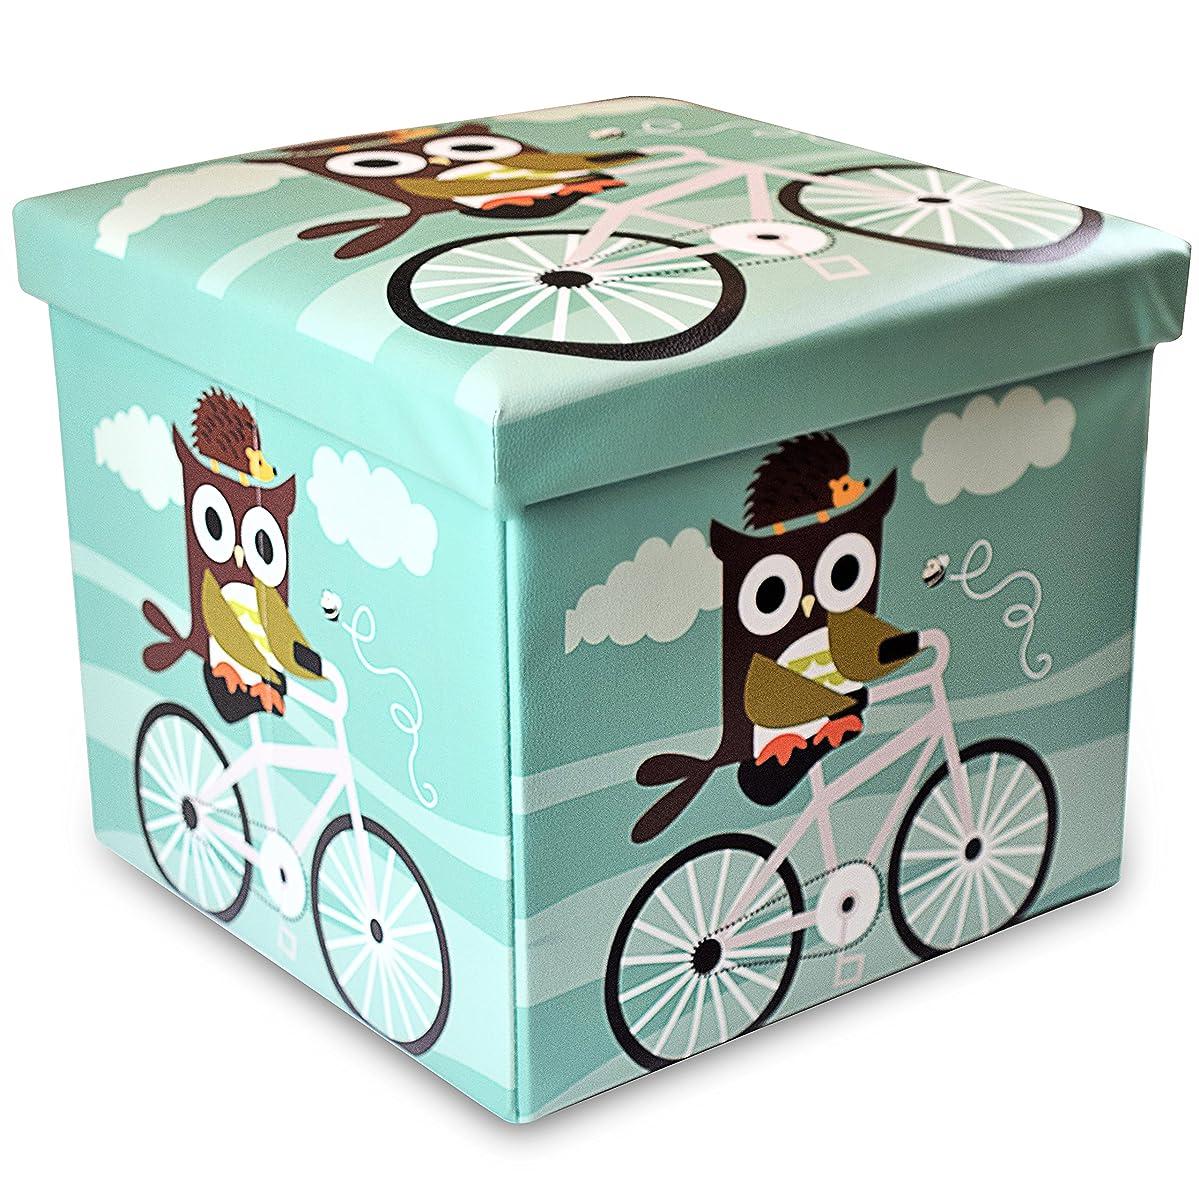 Stuff n Sit Kids Toy Storage Ottoman Folding Trunk Toy Chest For Kids Owl Decor Unisex Large 15'x15